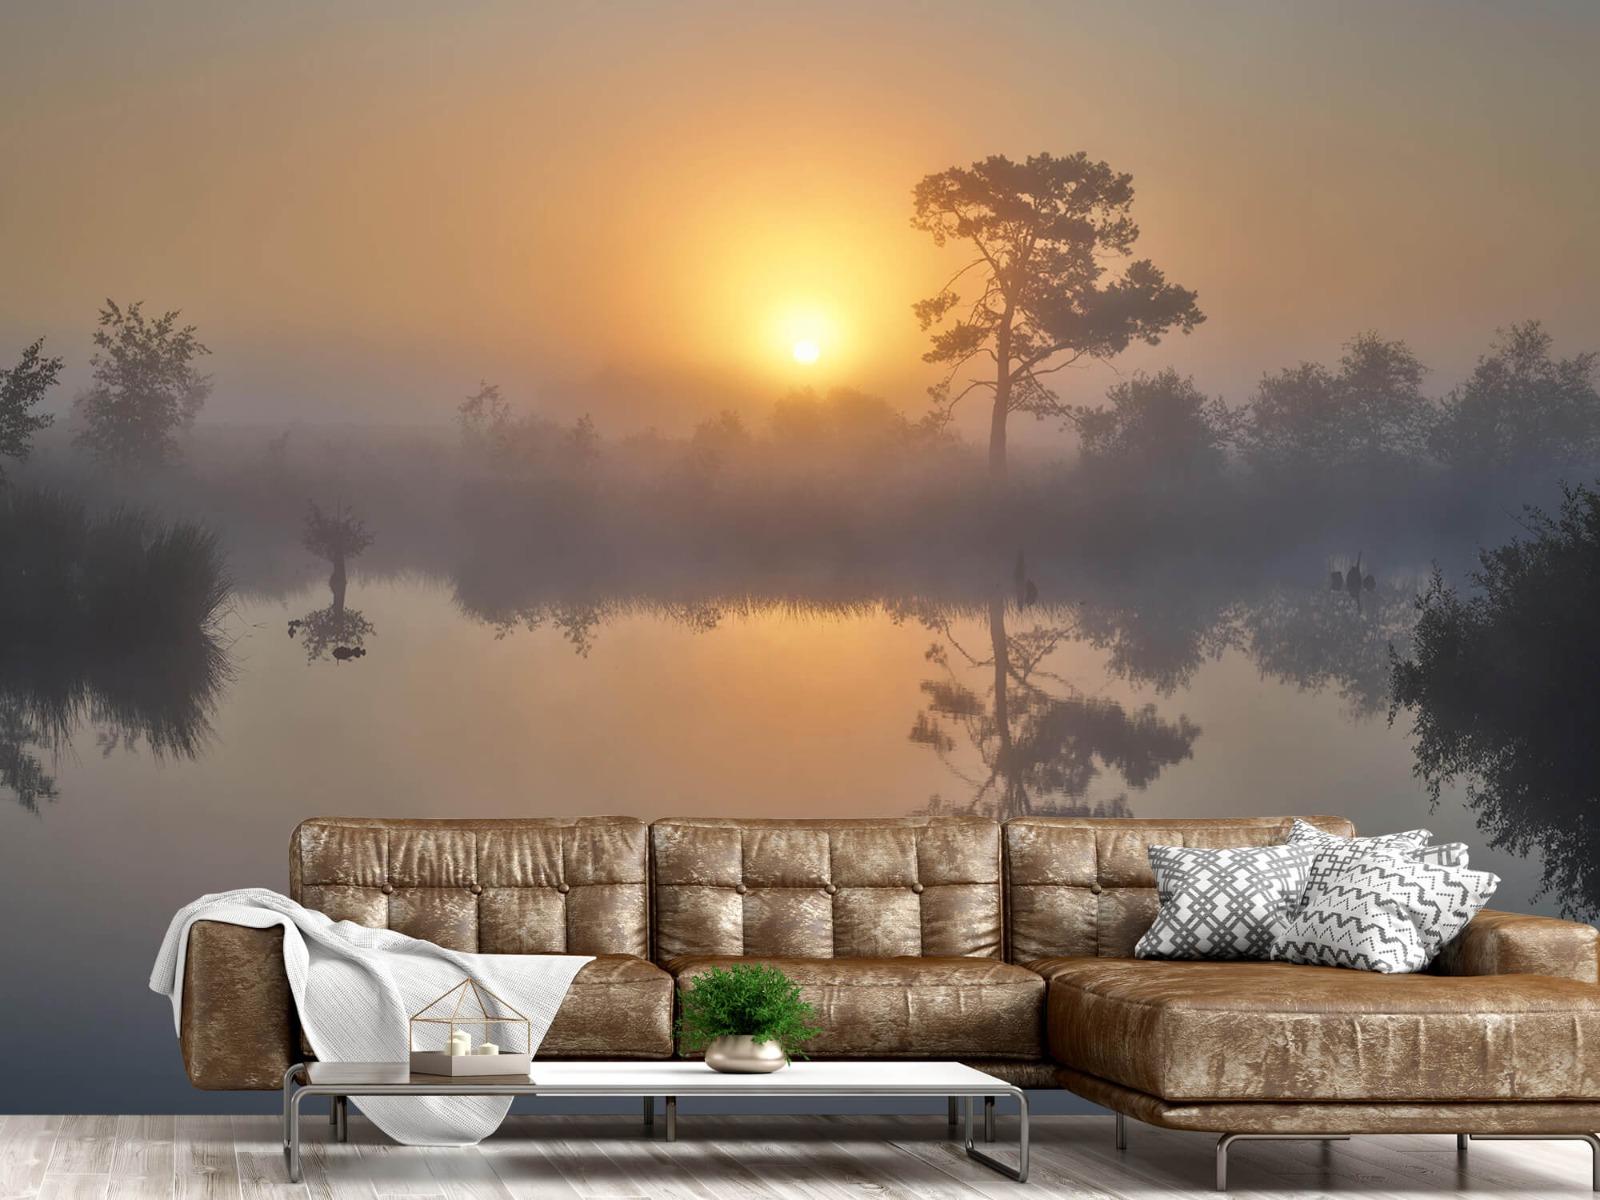 Natuur - Mistige zonsopkomst 15